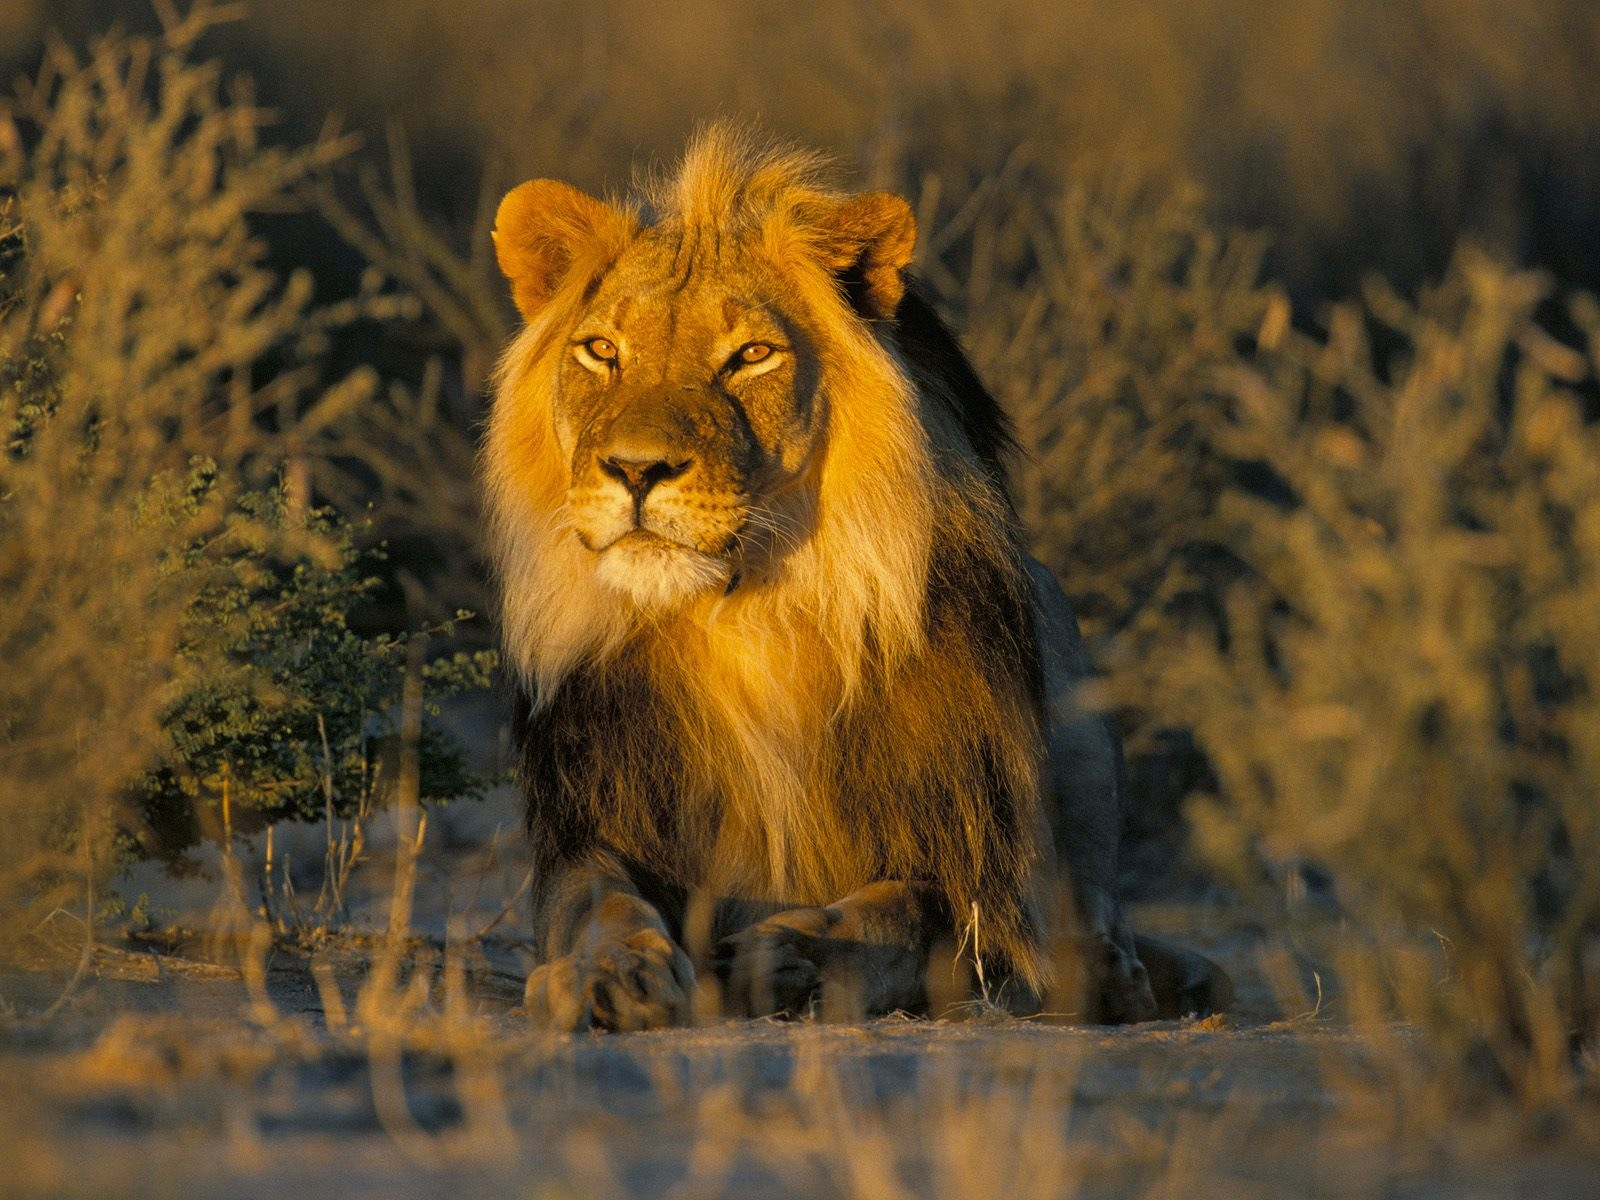 Wonderful Wallpaper Lion Facebook - MixoPlanet+%252811%2529  Pictures_488548.jpg